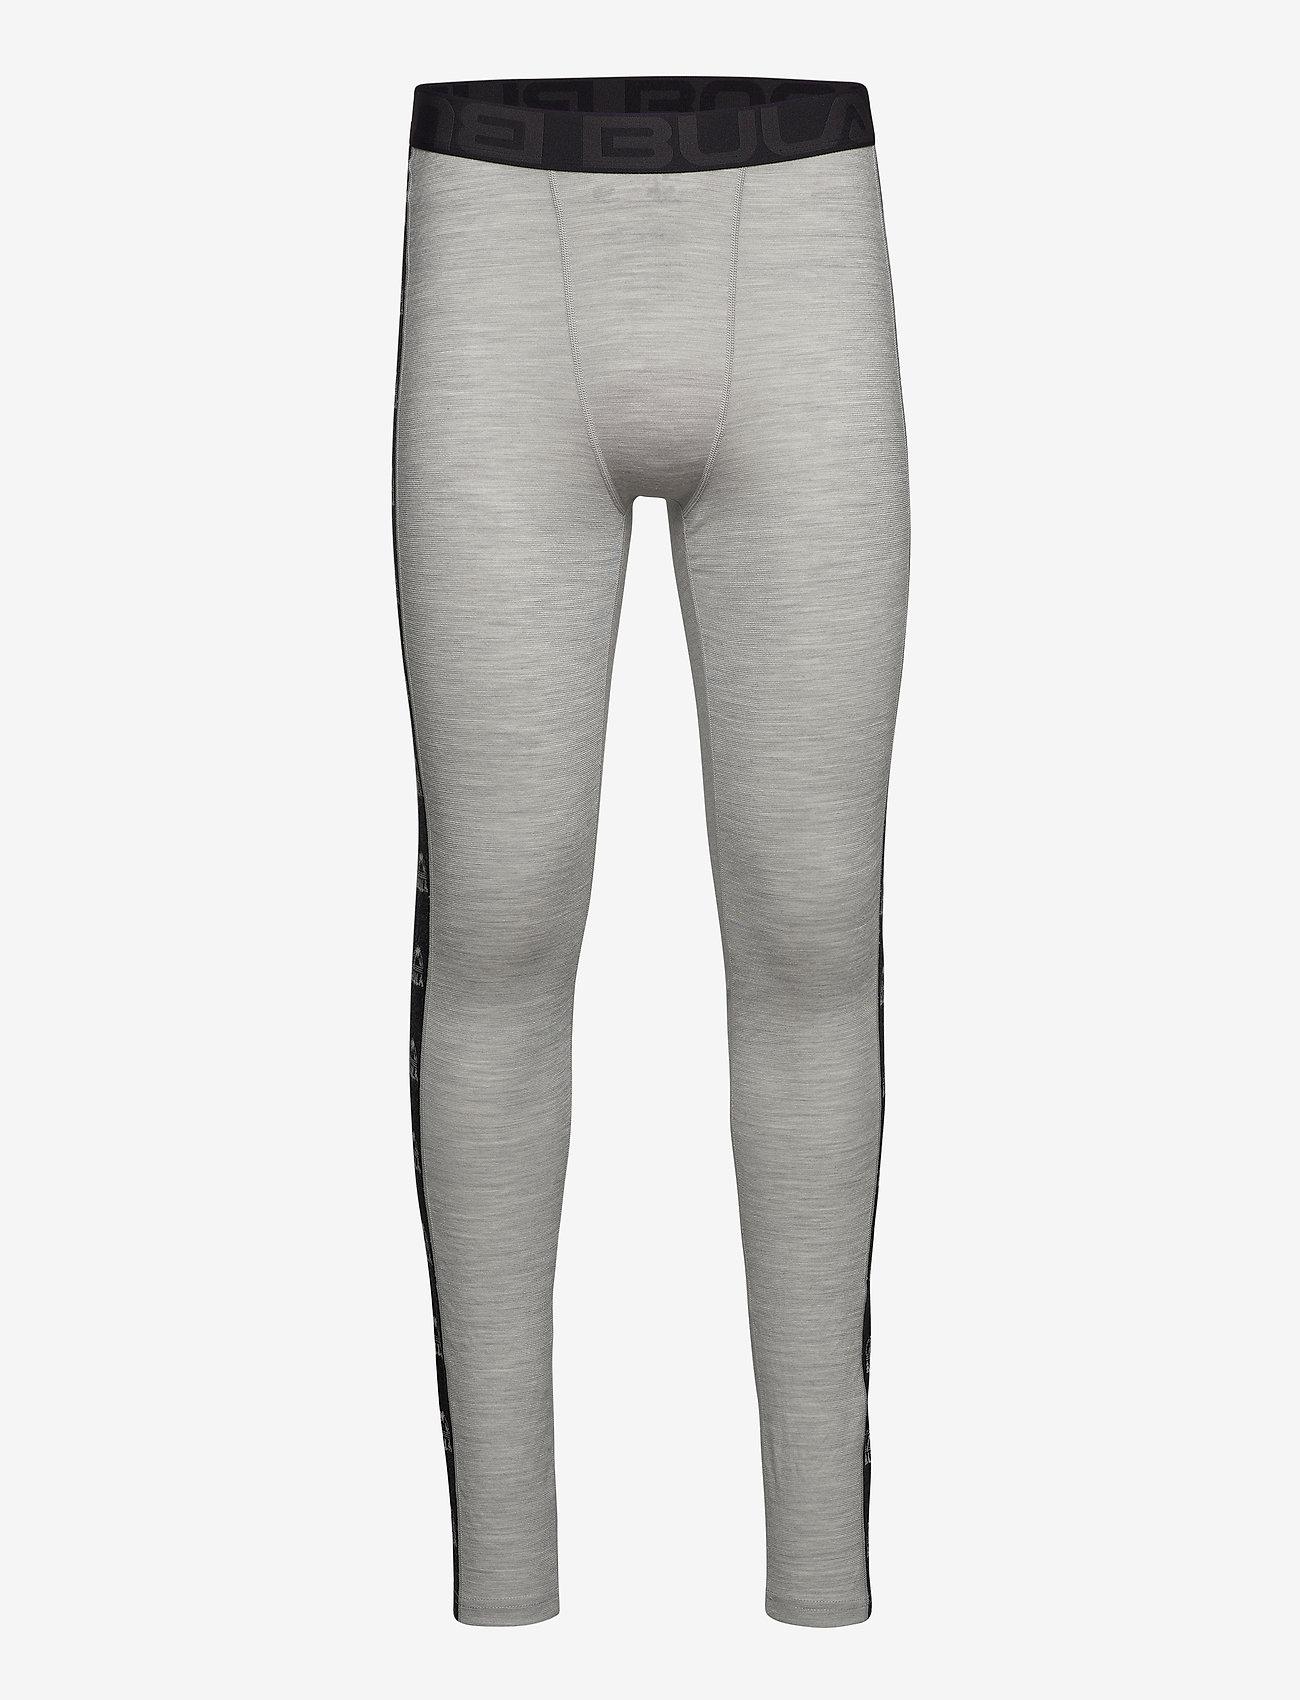 Bula - Tape Merino Wool Pants - funkionsunterwäsche - hosen - greym - 0